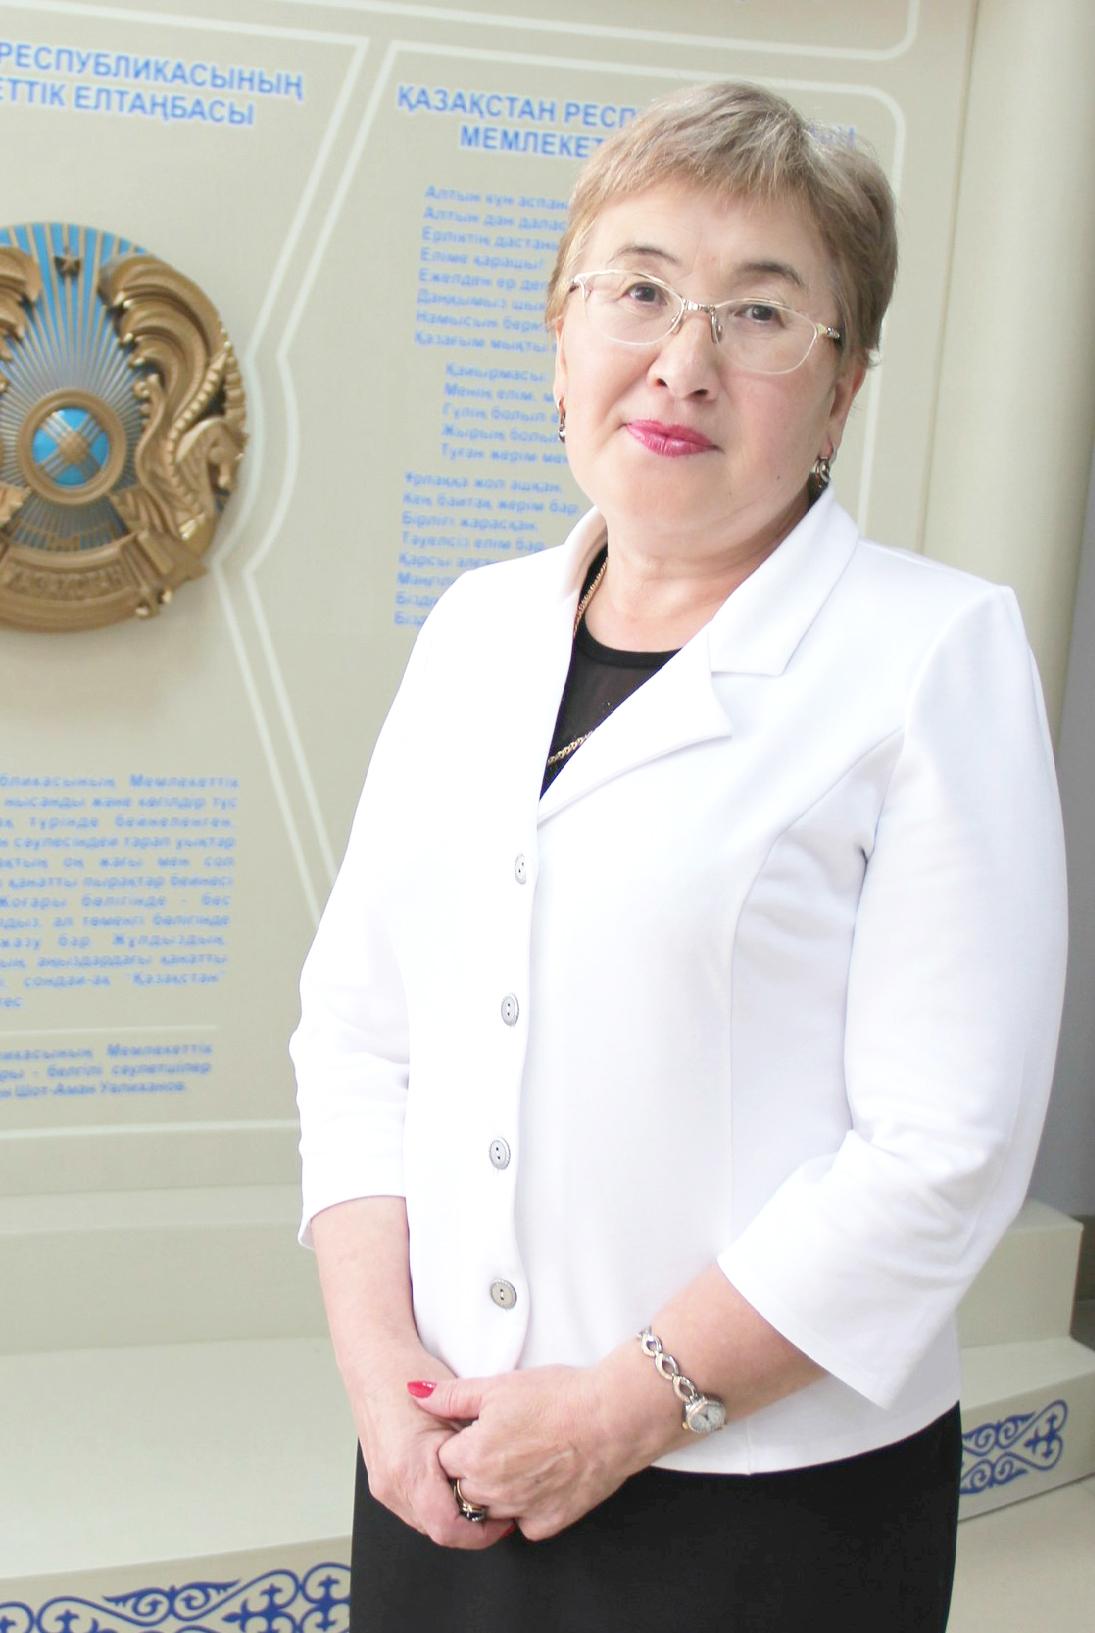 Баубекова  Зайнель Жагопаровна